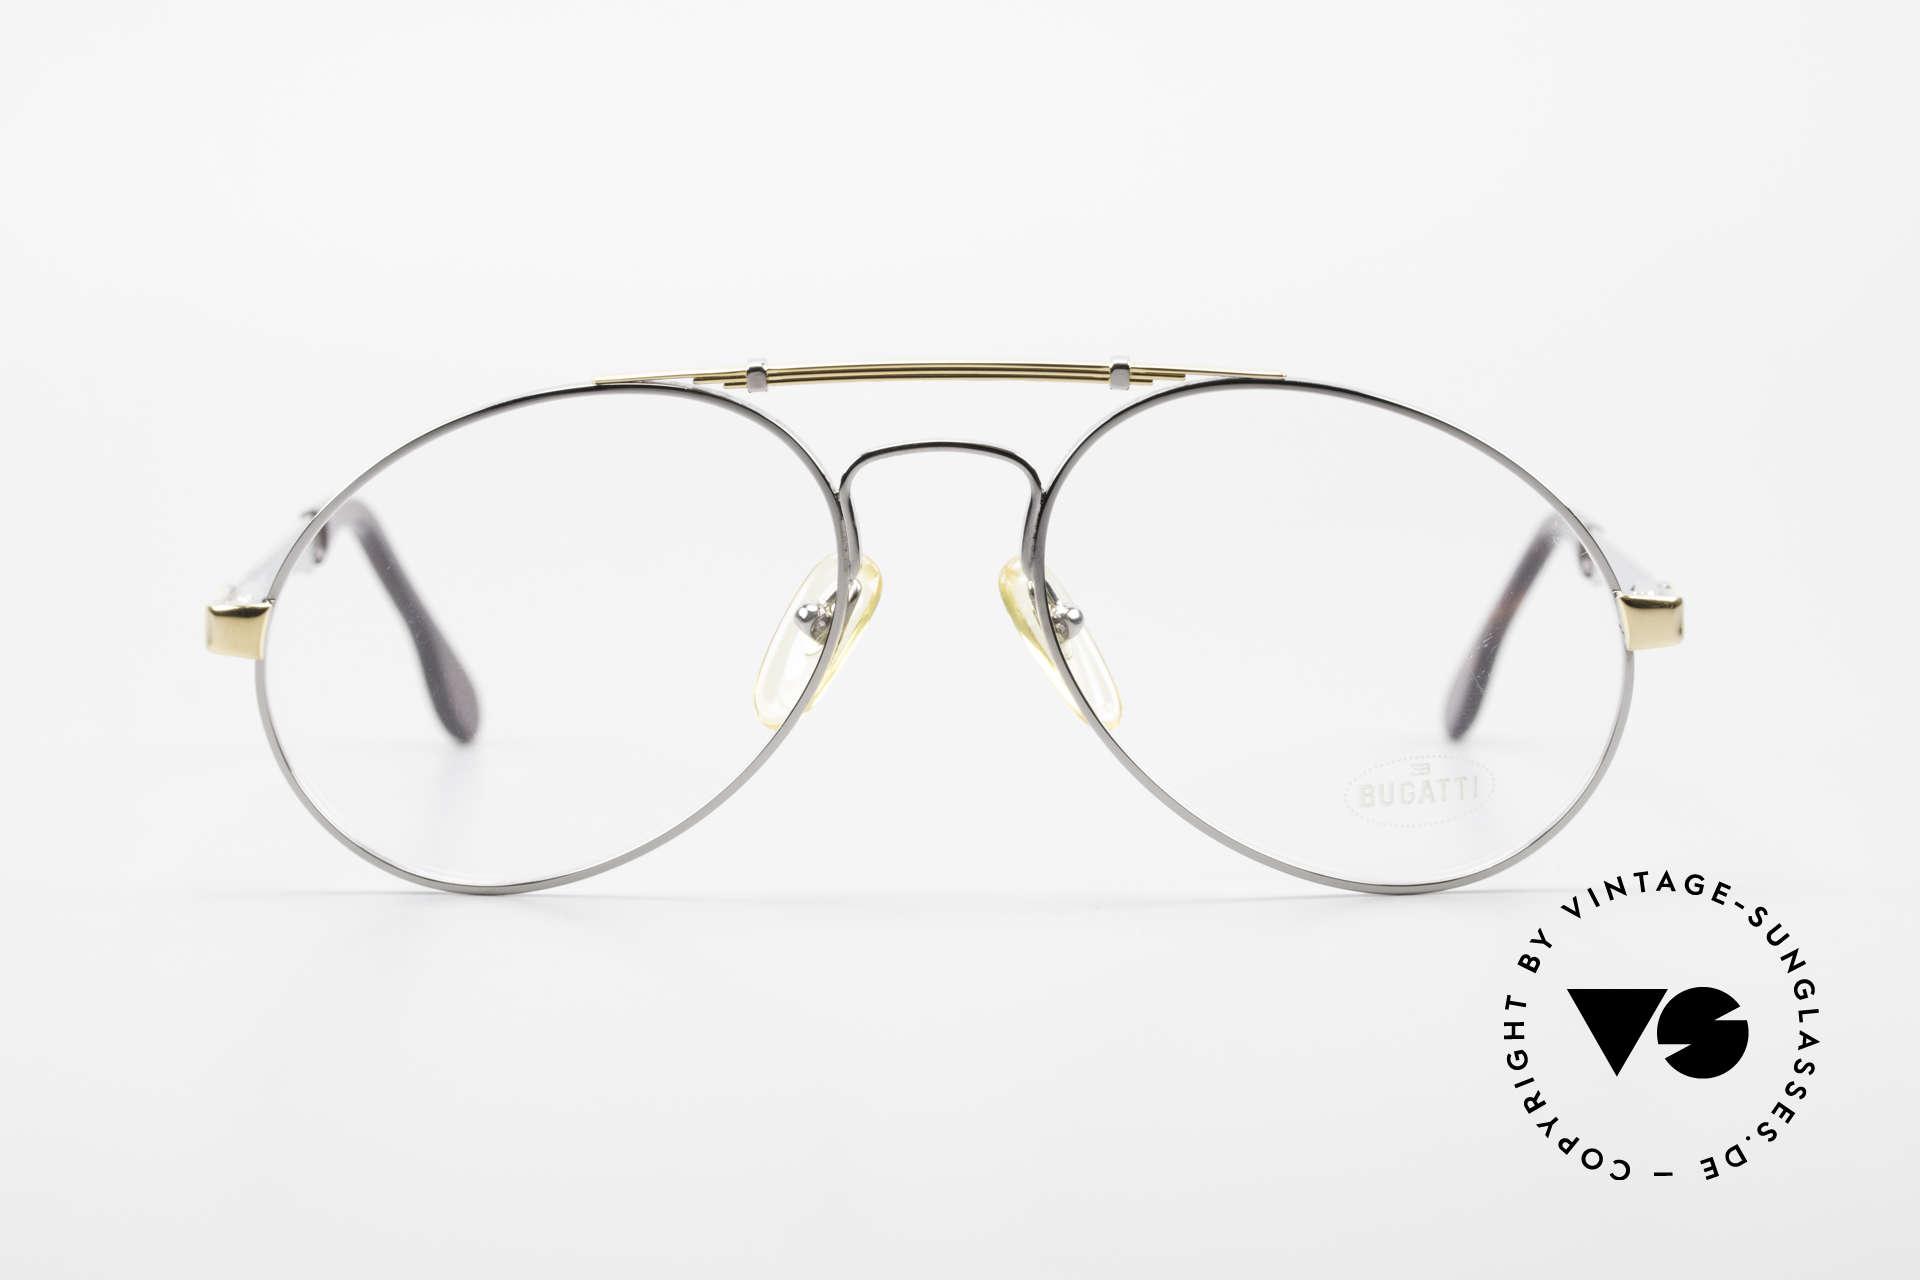 Bugatti 11946 Large 80's Luxury Eyeglasses, the Bugatti CLASSIC par excellence, a legend!, Made for Men